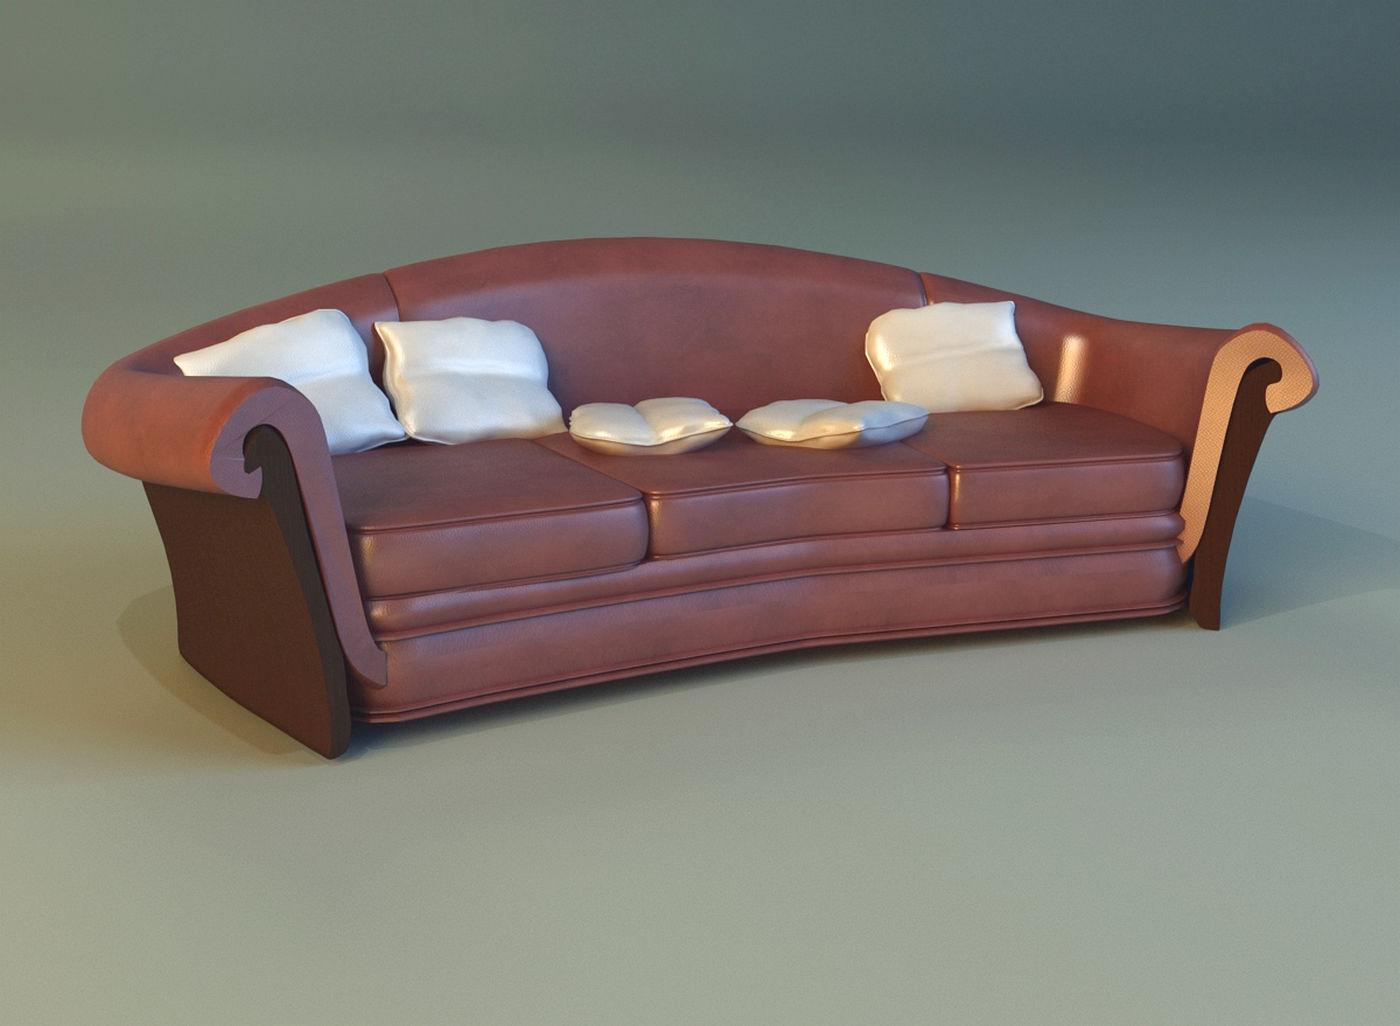 Sofa Luxury Leather Black 3D Model .max .obj .3ds .fbx